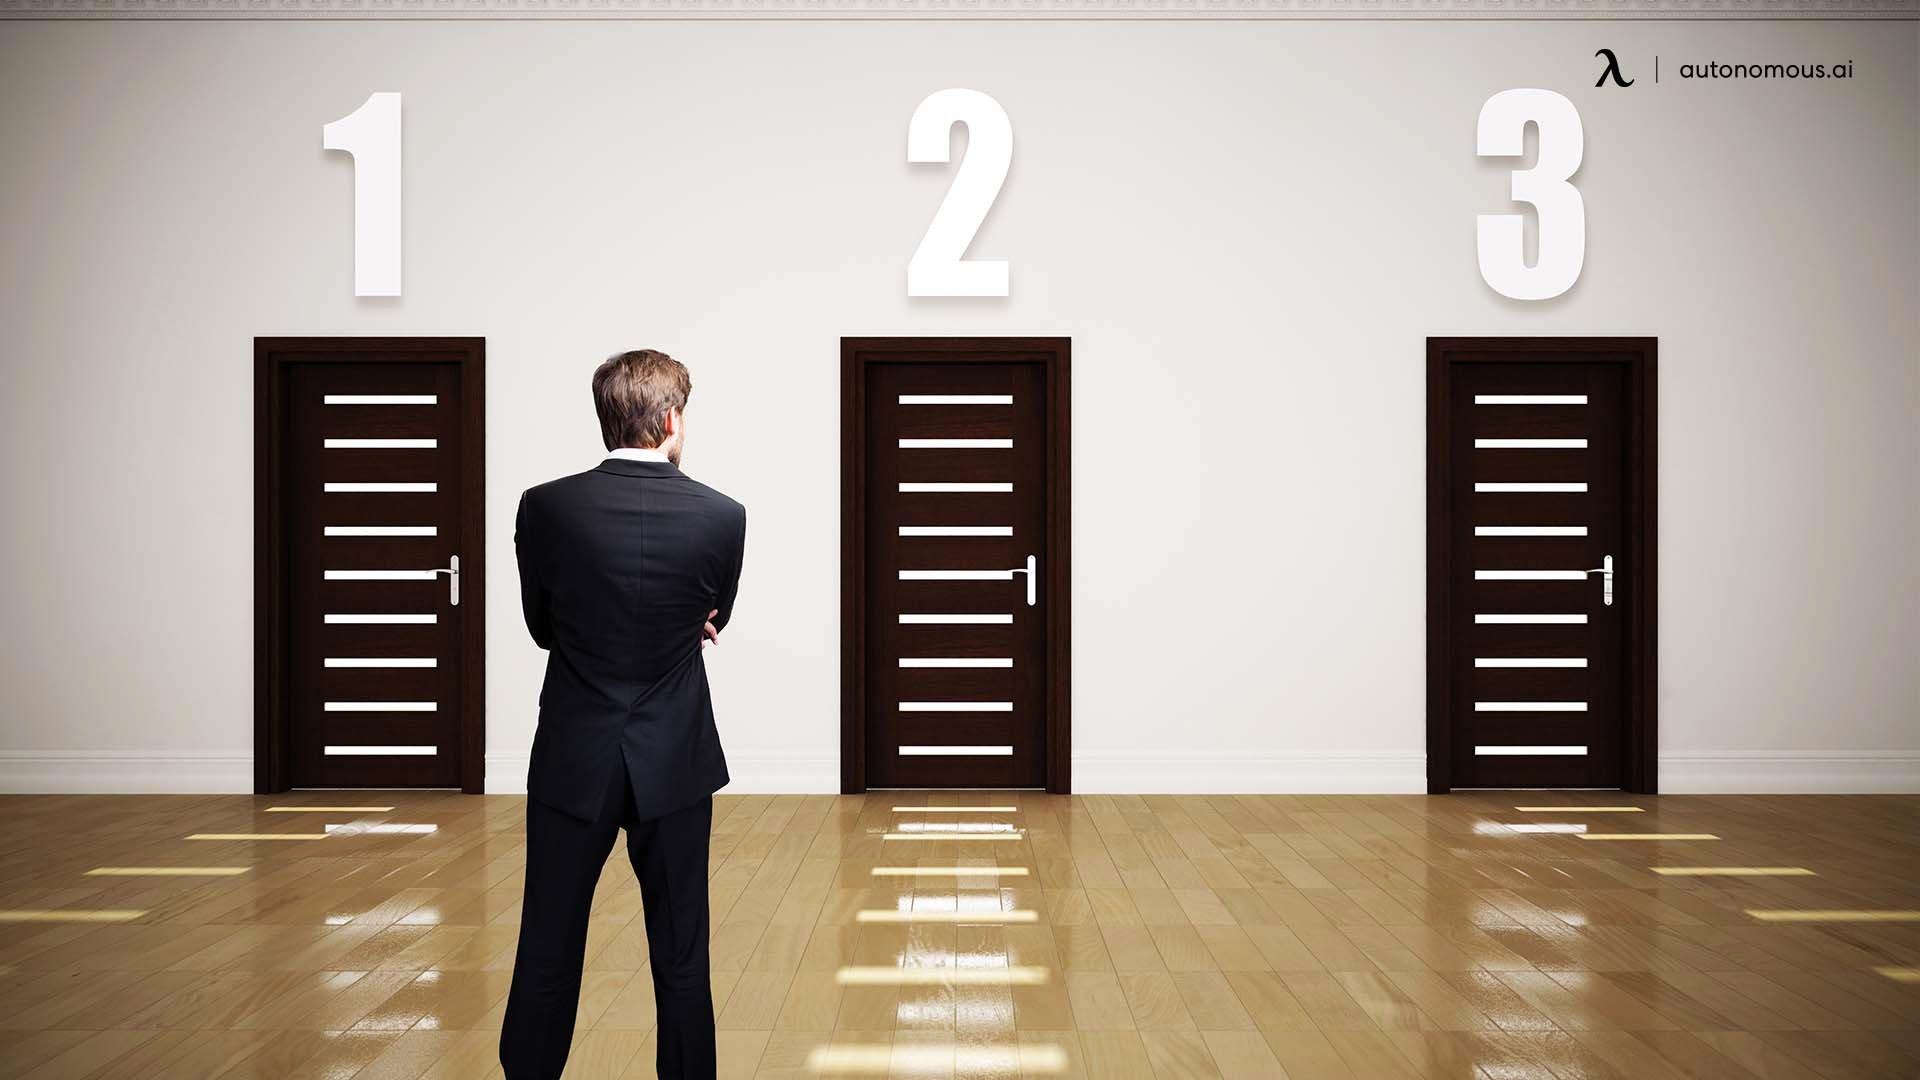 Provide multiple work options